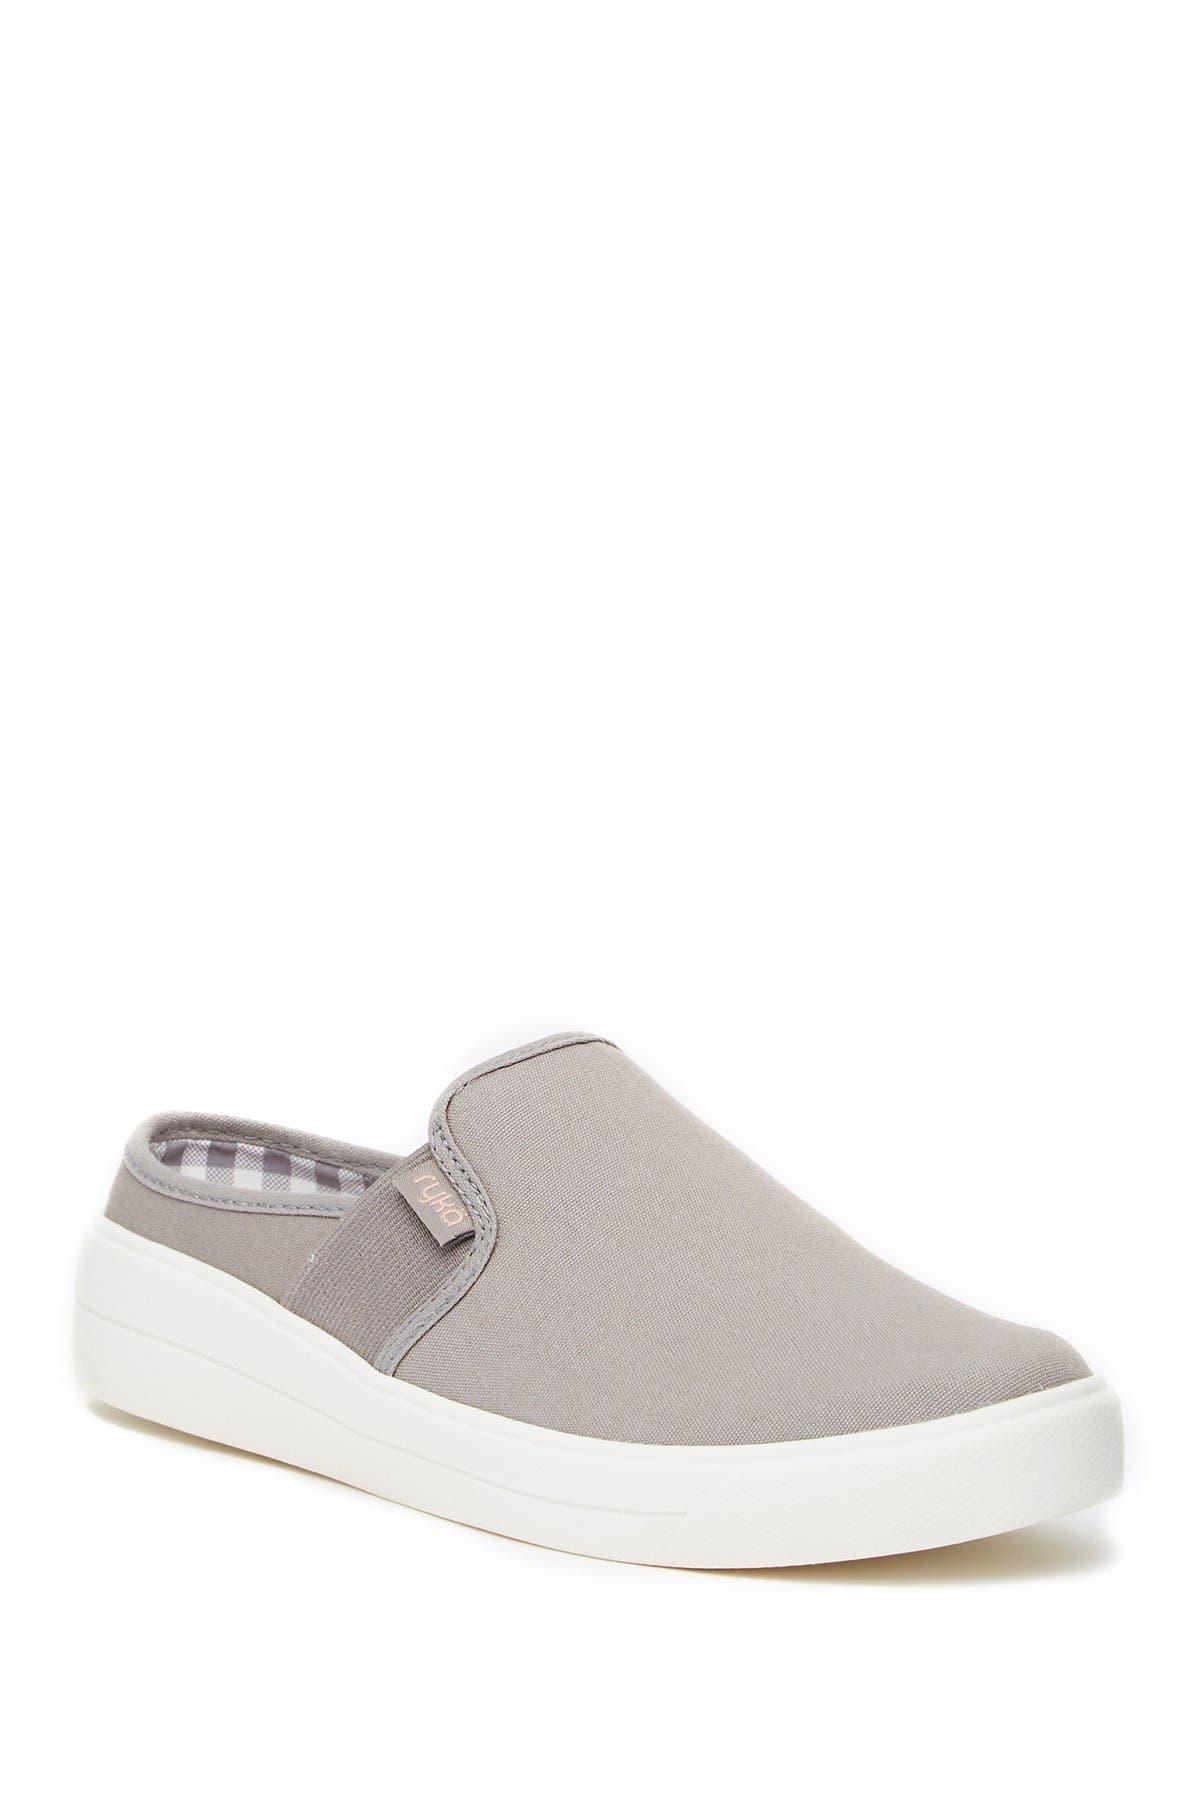 Ryka | Valerie Slip-On Sneaker - Wide